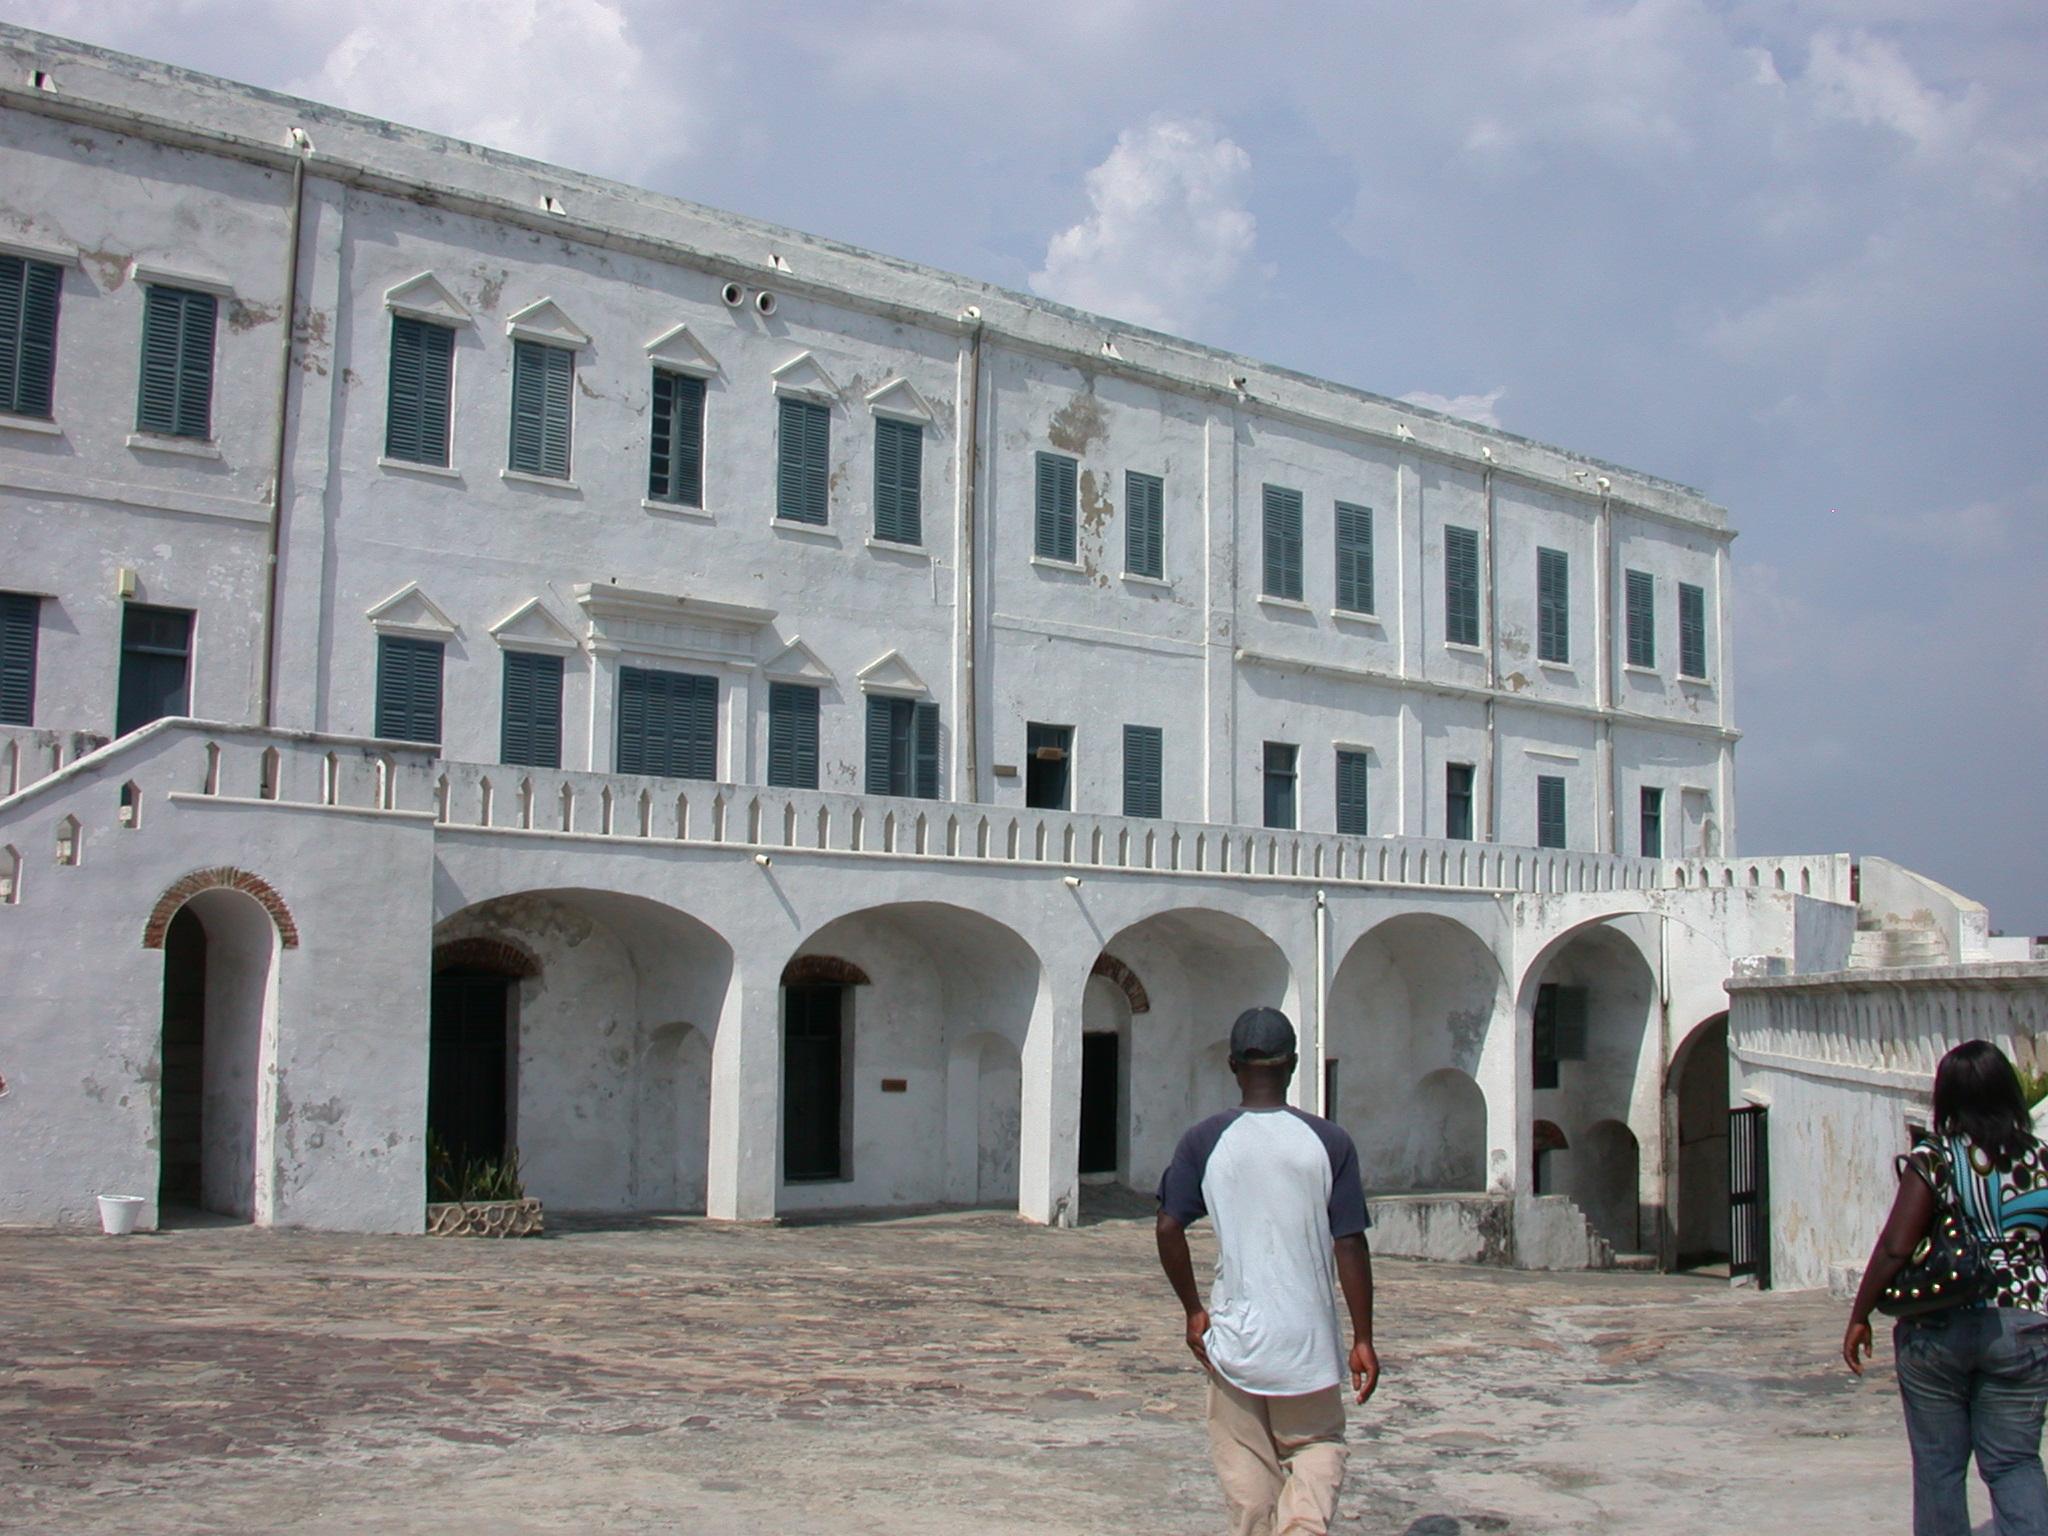 Courtyard, Cape Coast Slave Fort, Cape Coast, Ghana